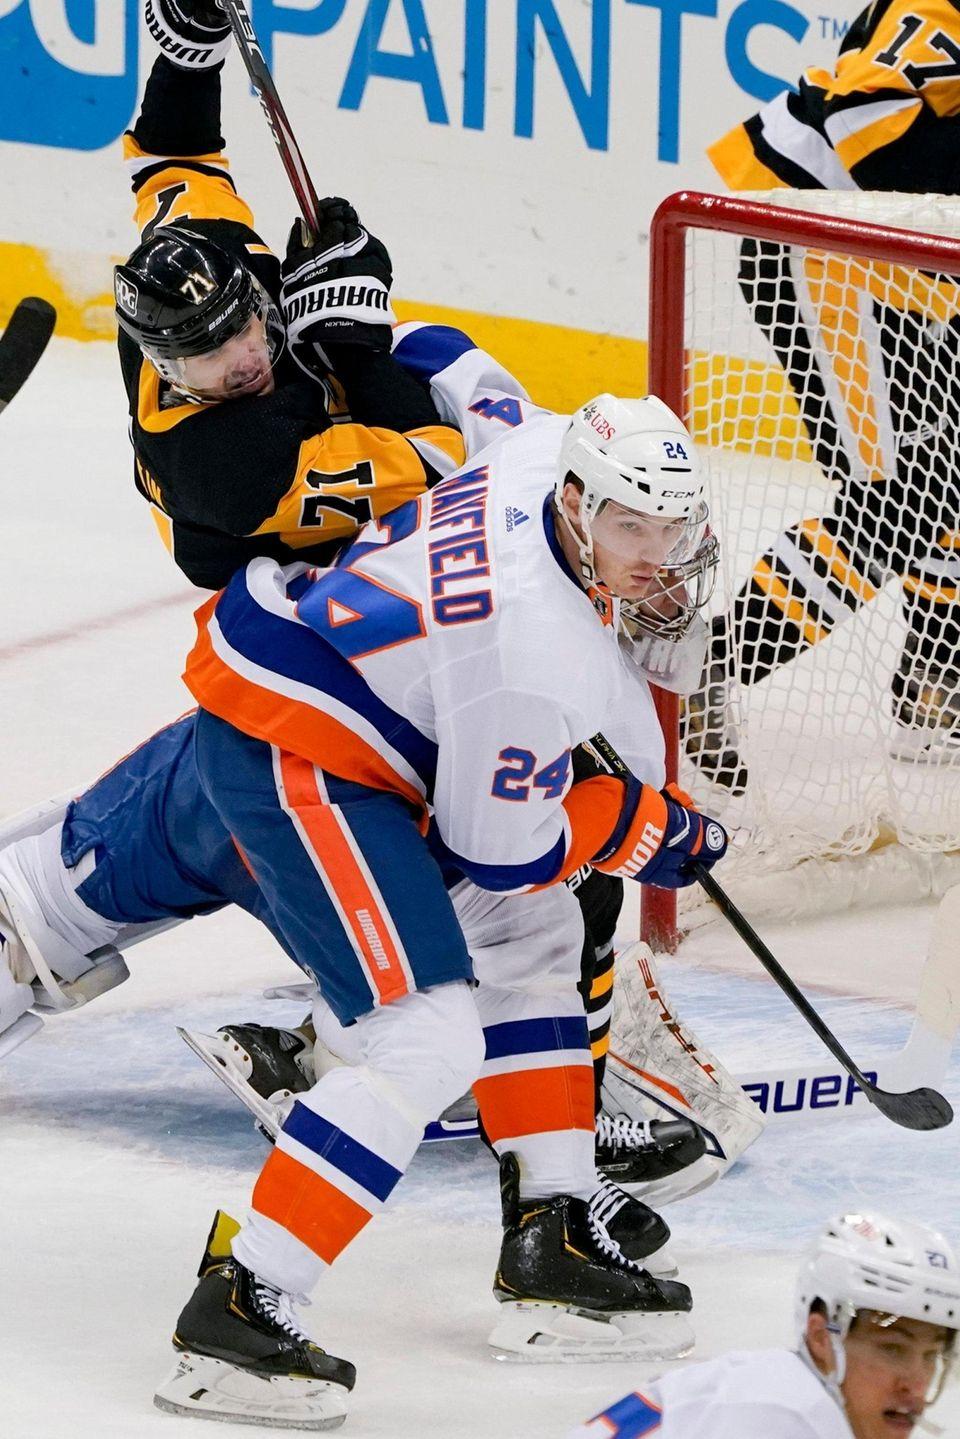 Pittsburgh Penguins' Evgeni Malkin (71) tumbles over New